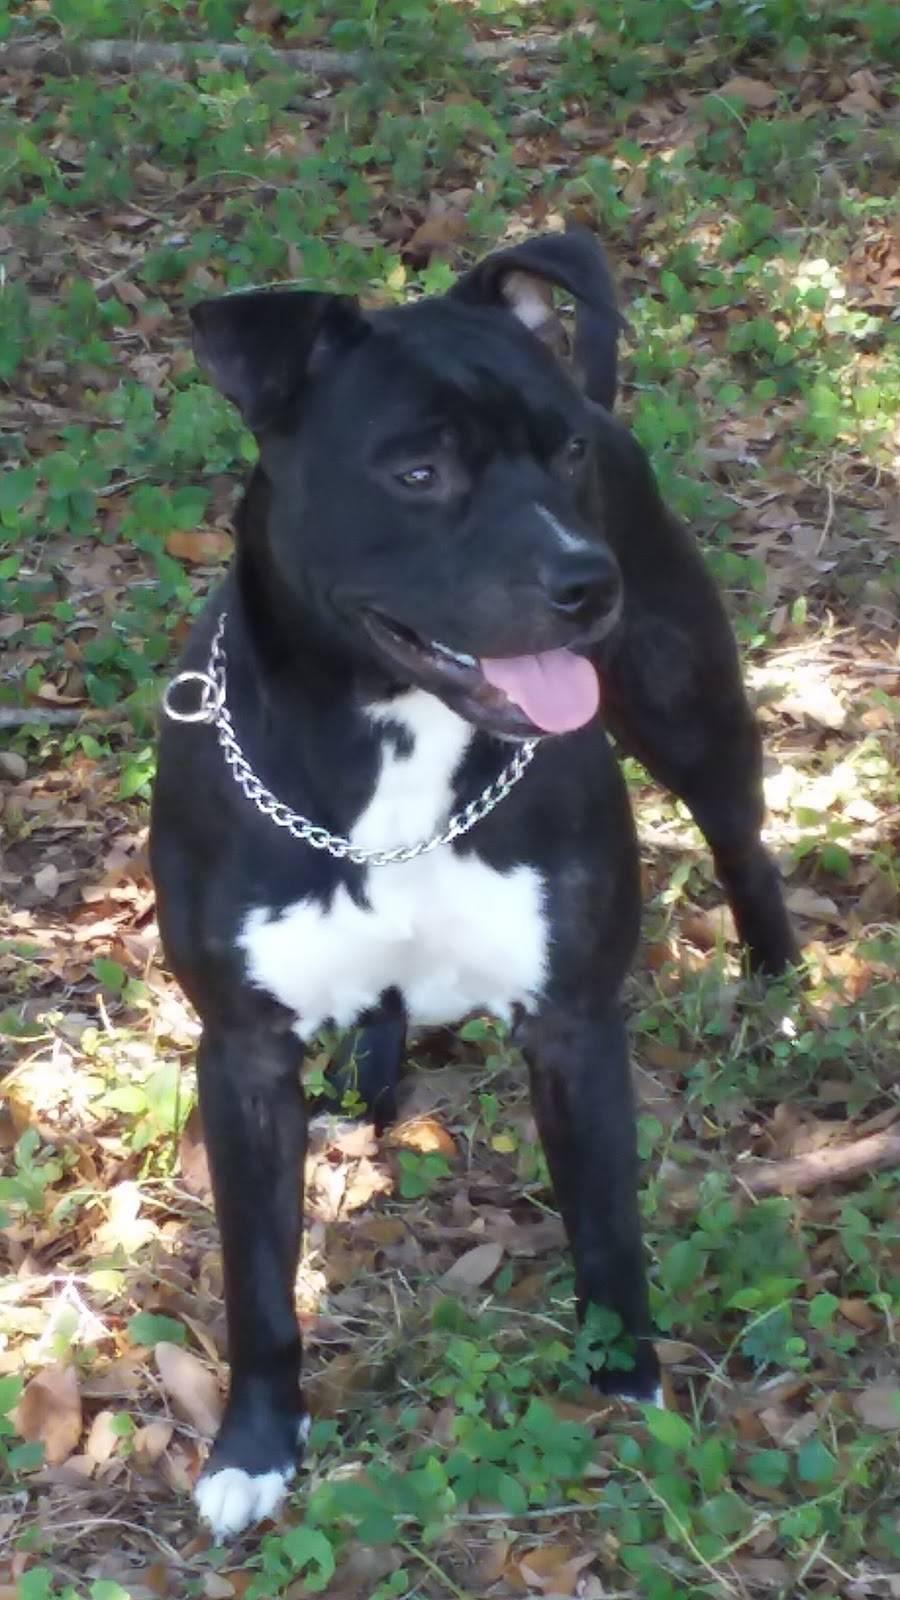 TLC Petsnip Inc. - veterinary care  | Photo 8 of 8 | Address: 11524 US-92 E, Seffner, FL 33584, USA | Phone: (863) 686-7647 ext. 140